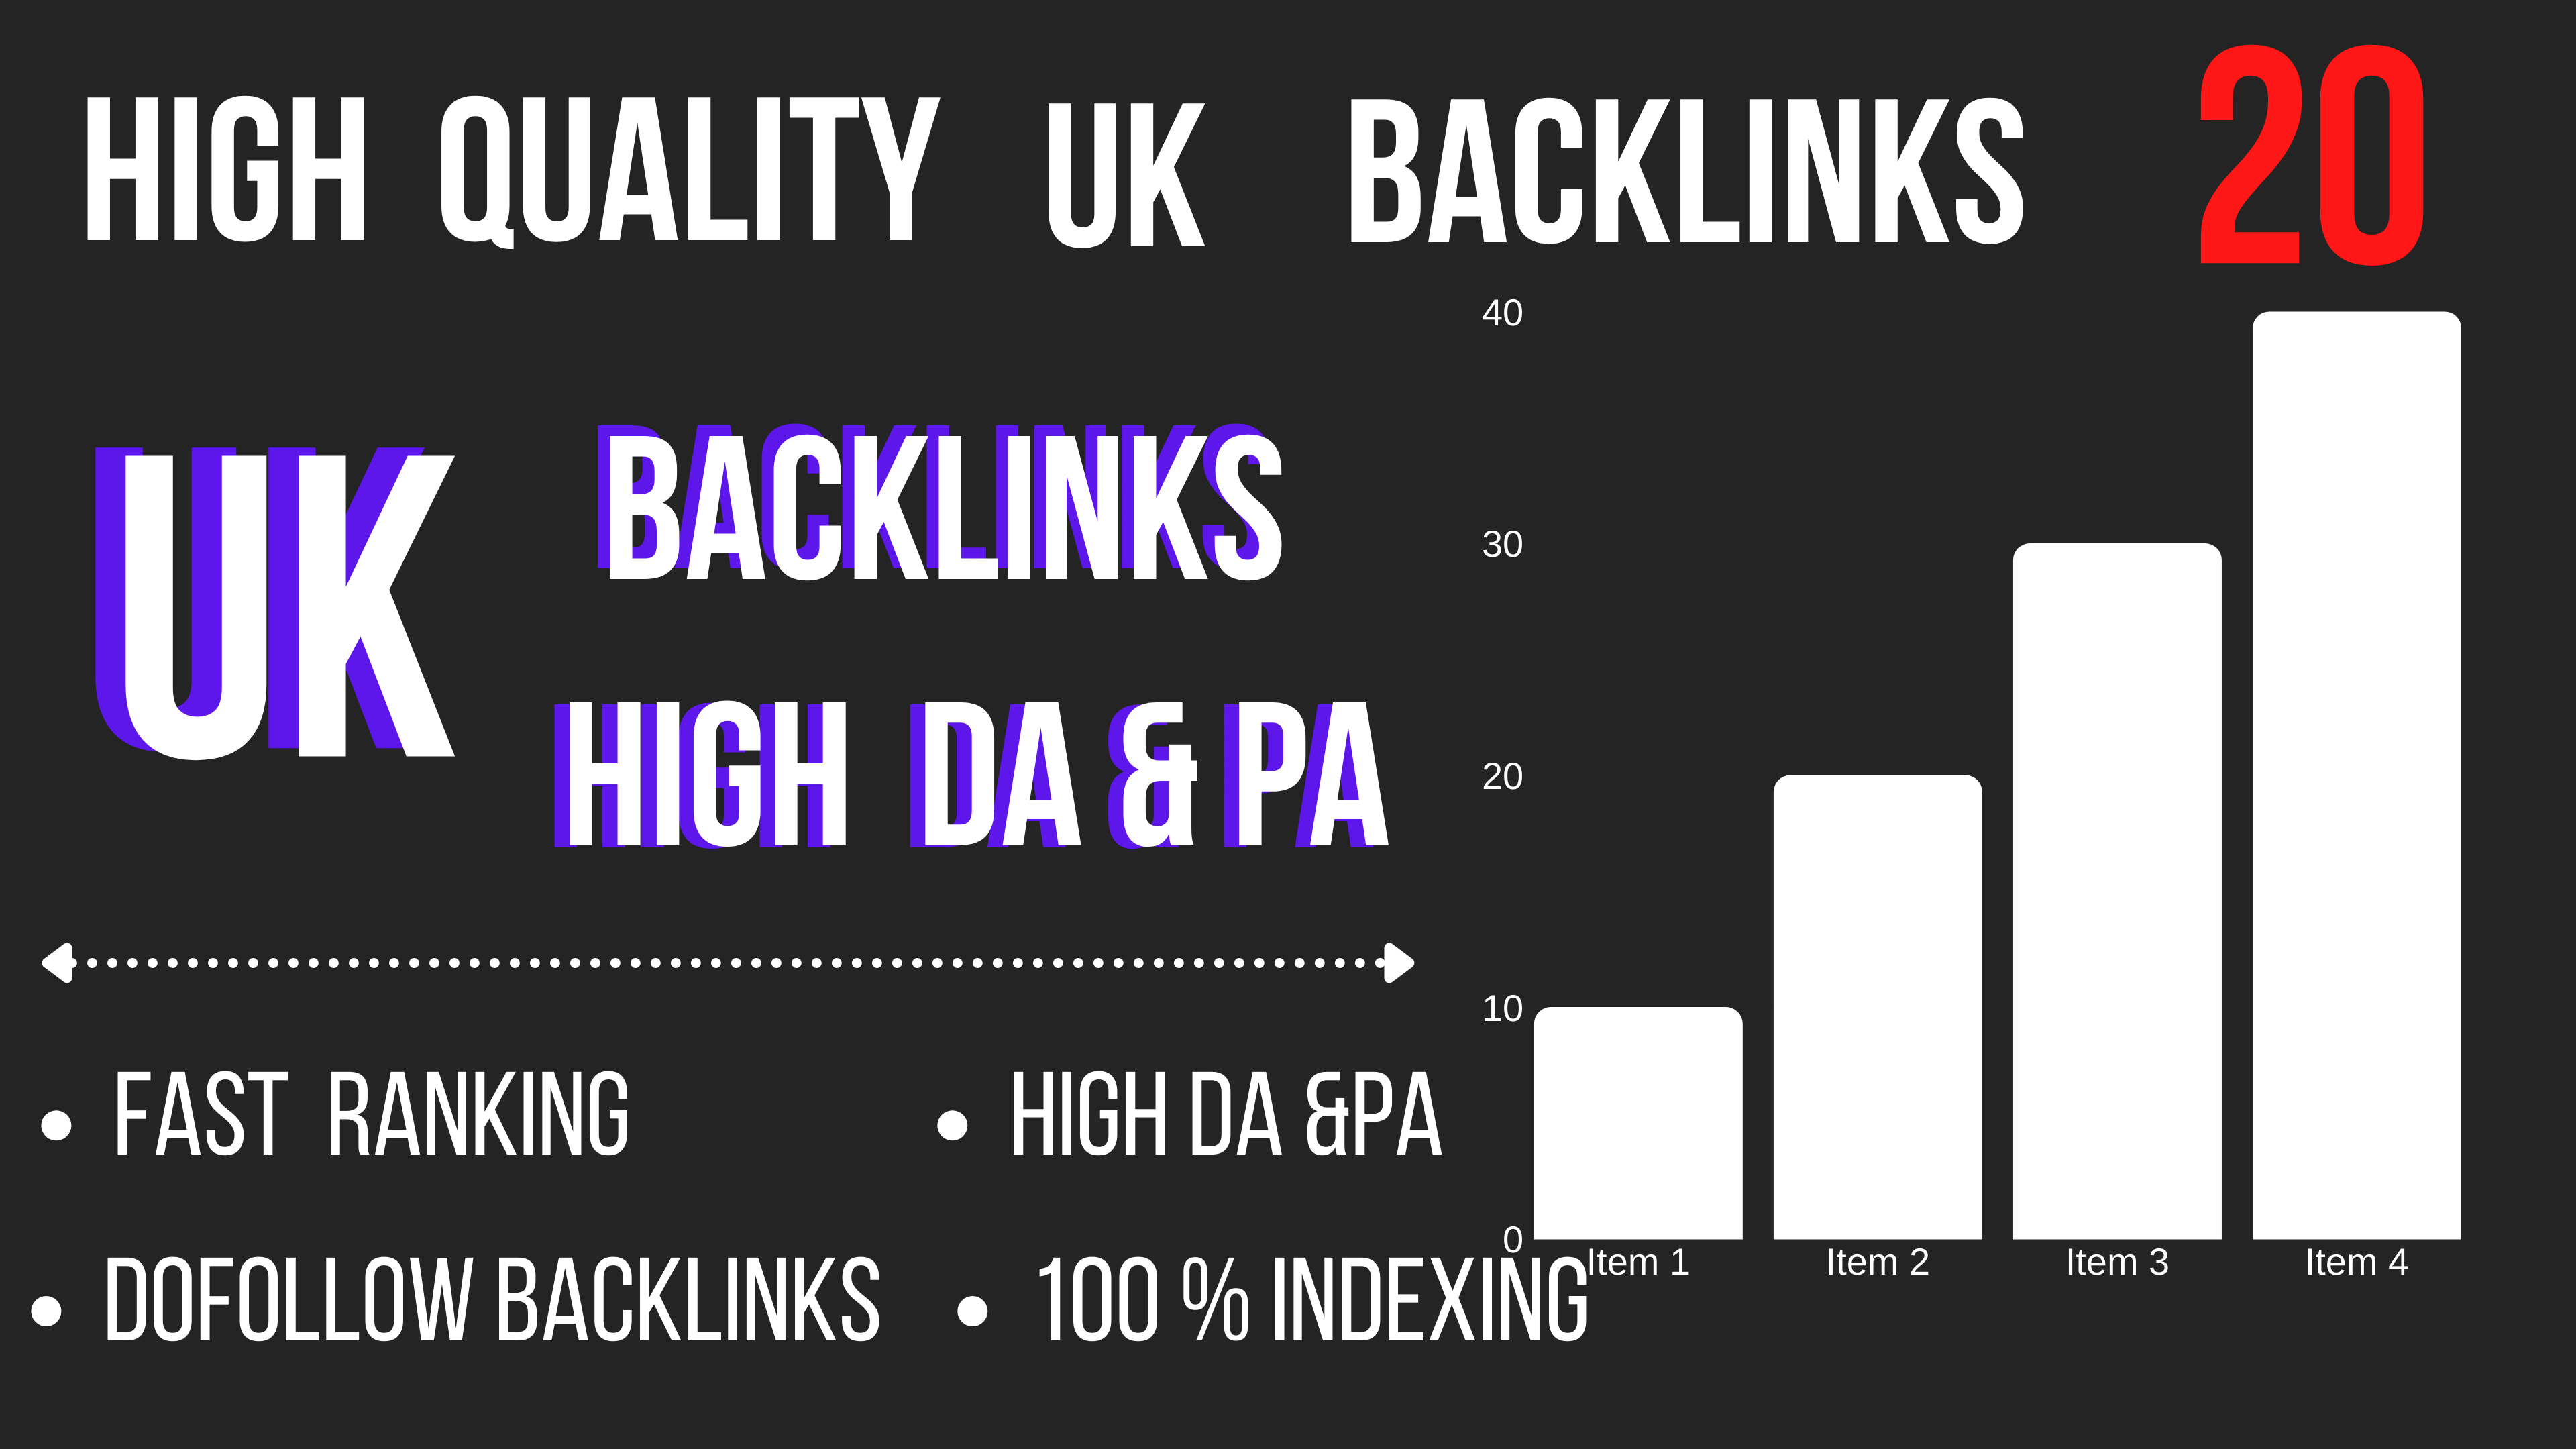 Manually Create 20 High Quality UK Backlinks High DA and PA Sites